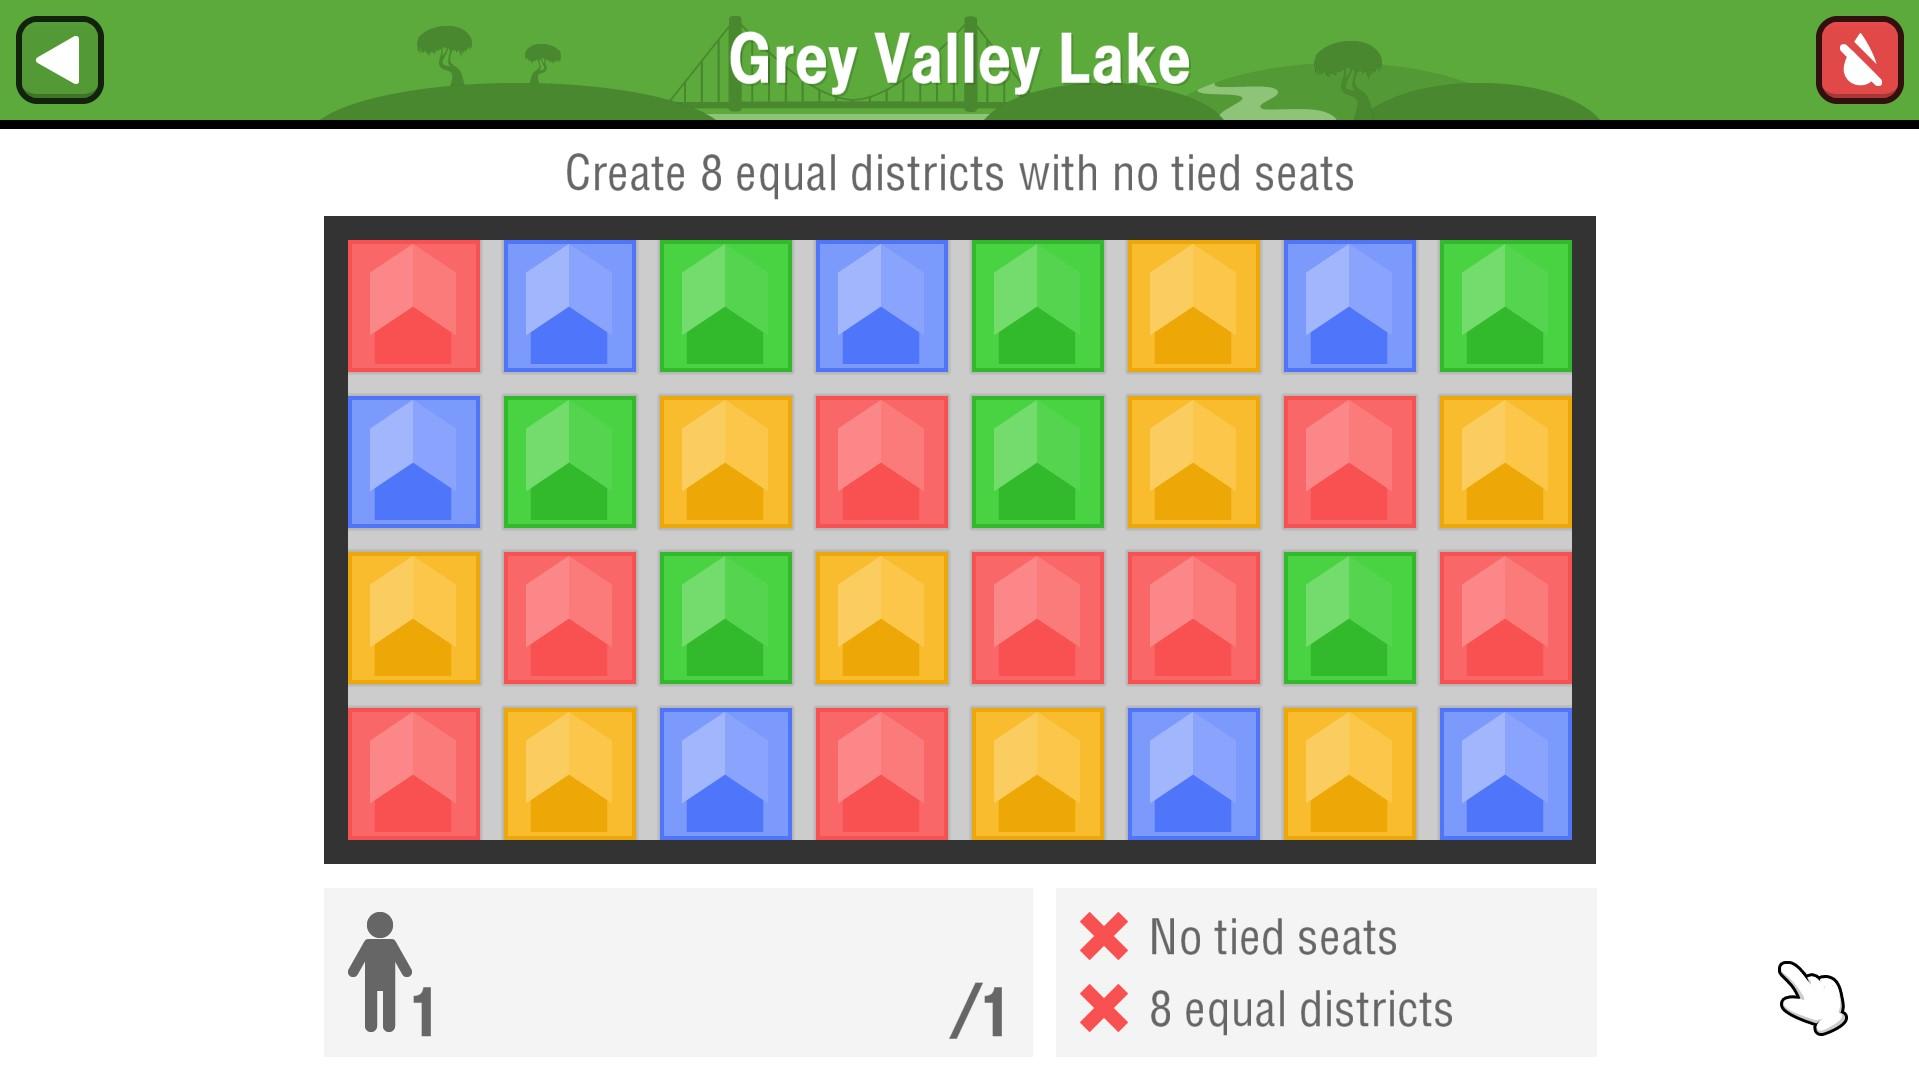 Grey Valley Lake